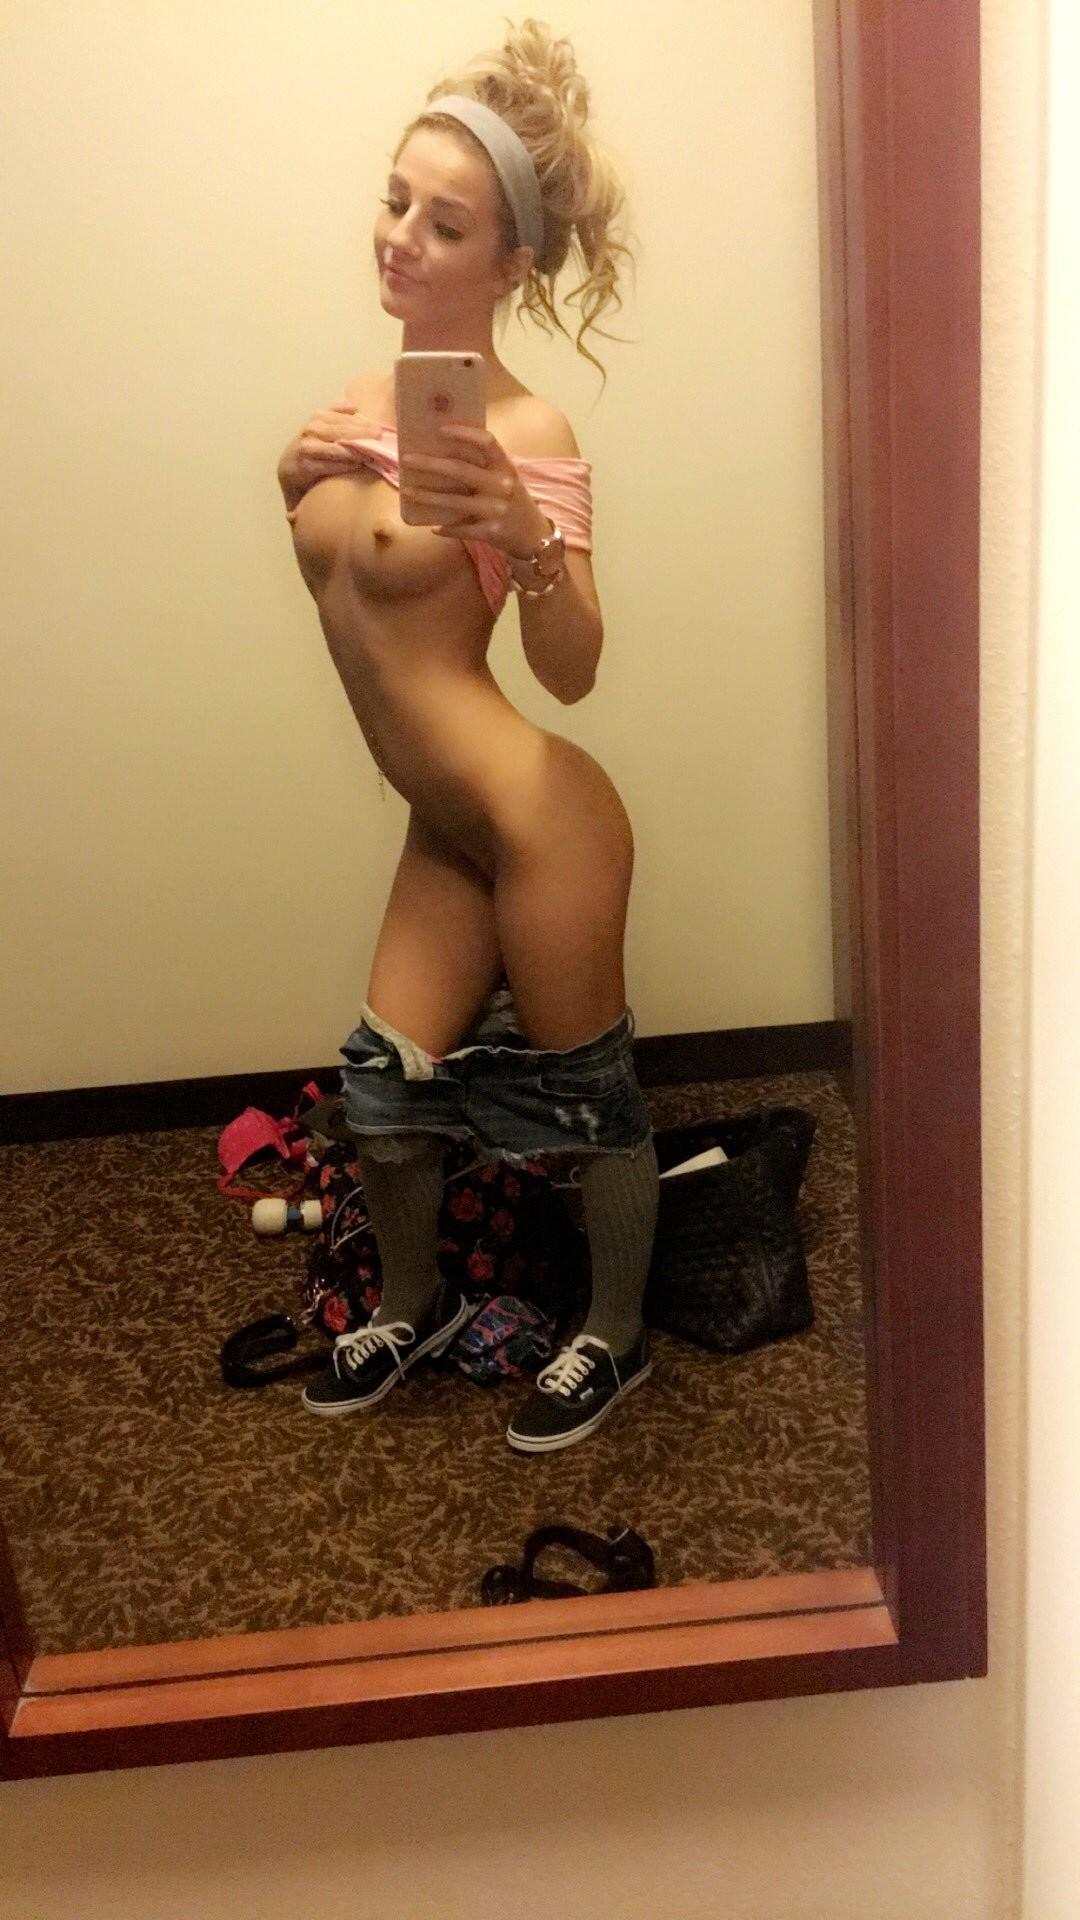 selfie-naked-girls-selfshot-amateur-mix-vol5-51